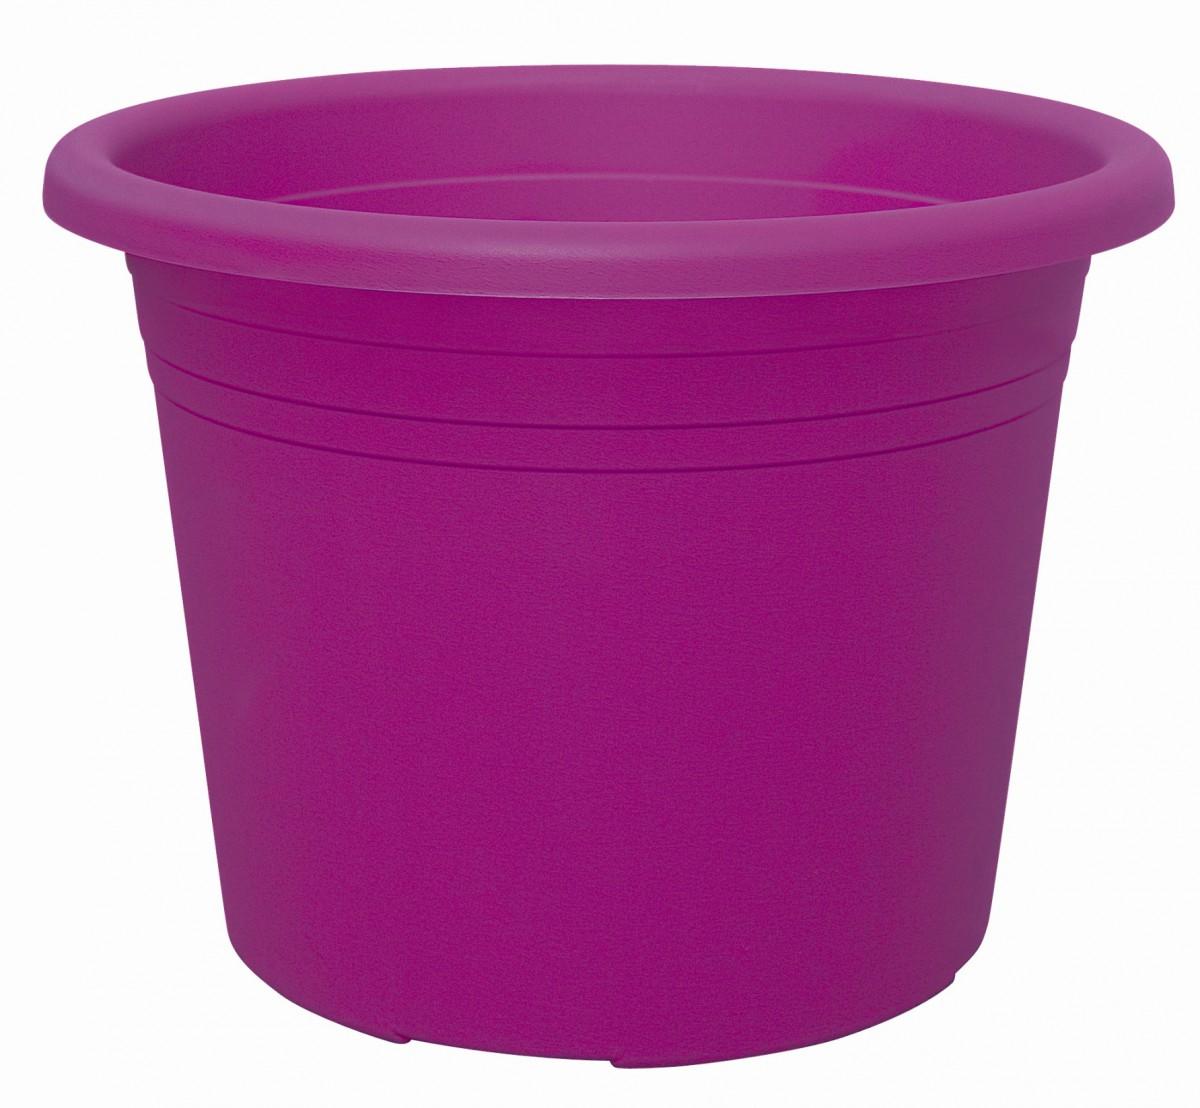 blumenk bel cylindro colours rund aus kunststoff in purple gartencenter pflanzgef e t pfe. Black Bedroom Furniture Sets. Home Design Ideas